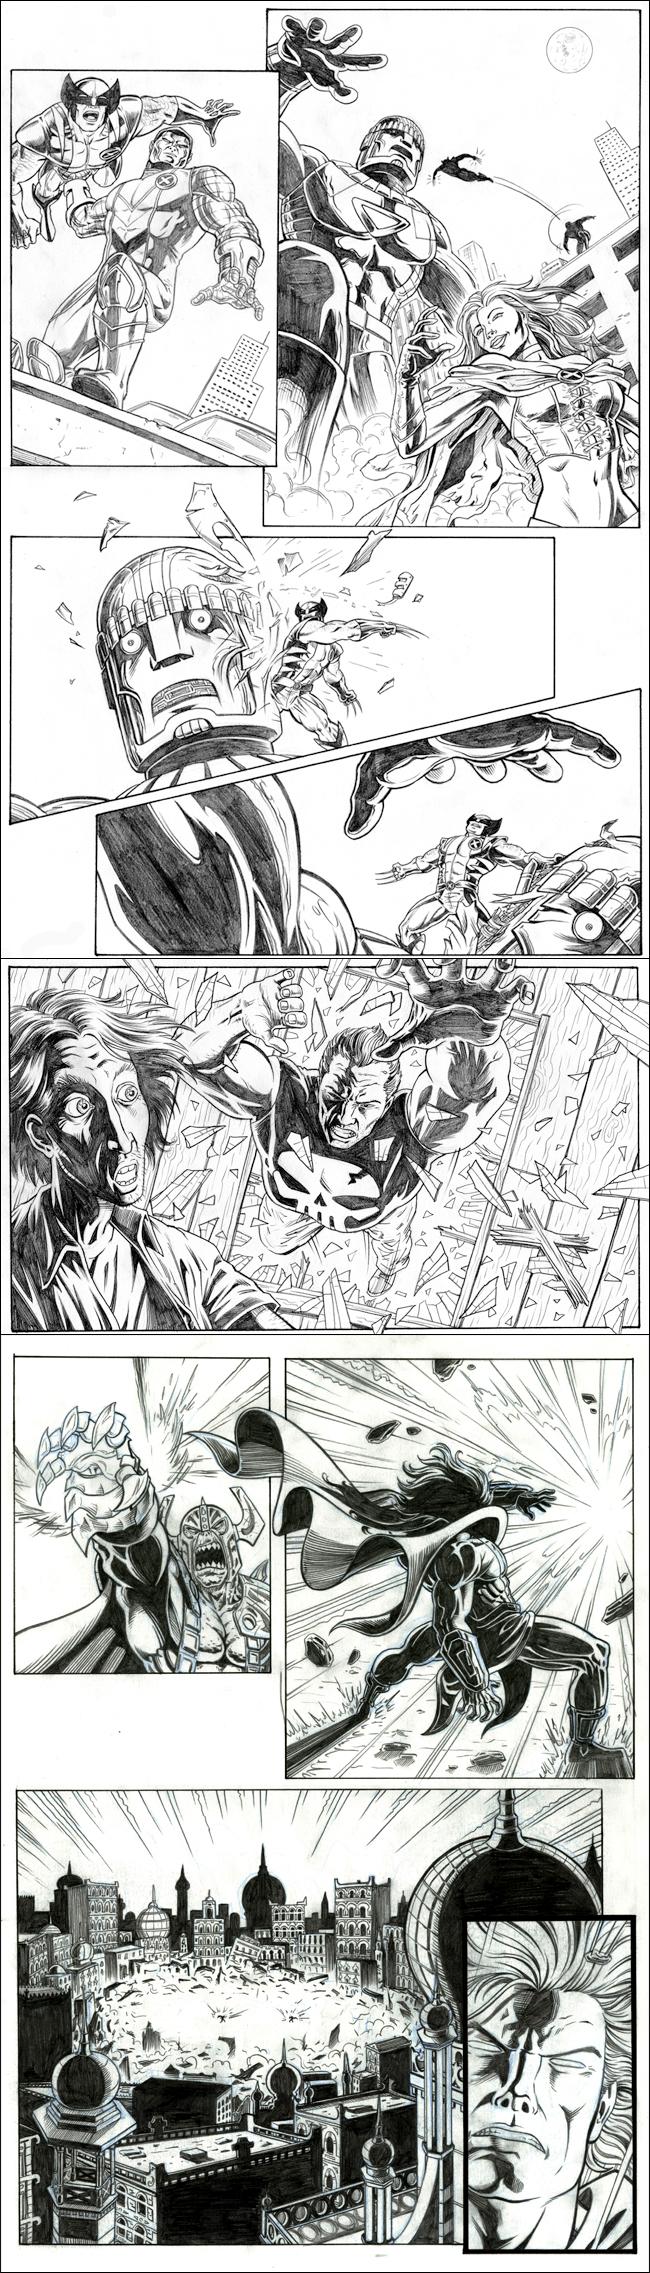 Comic de superheroes. Cursos de. Academia C10.